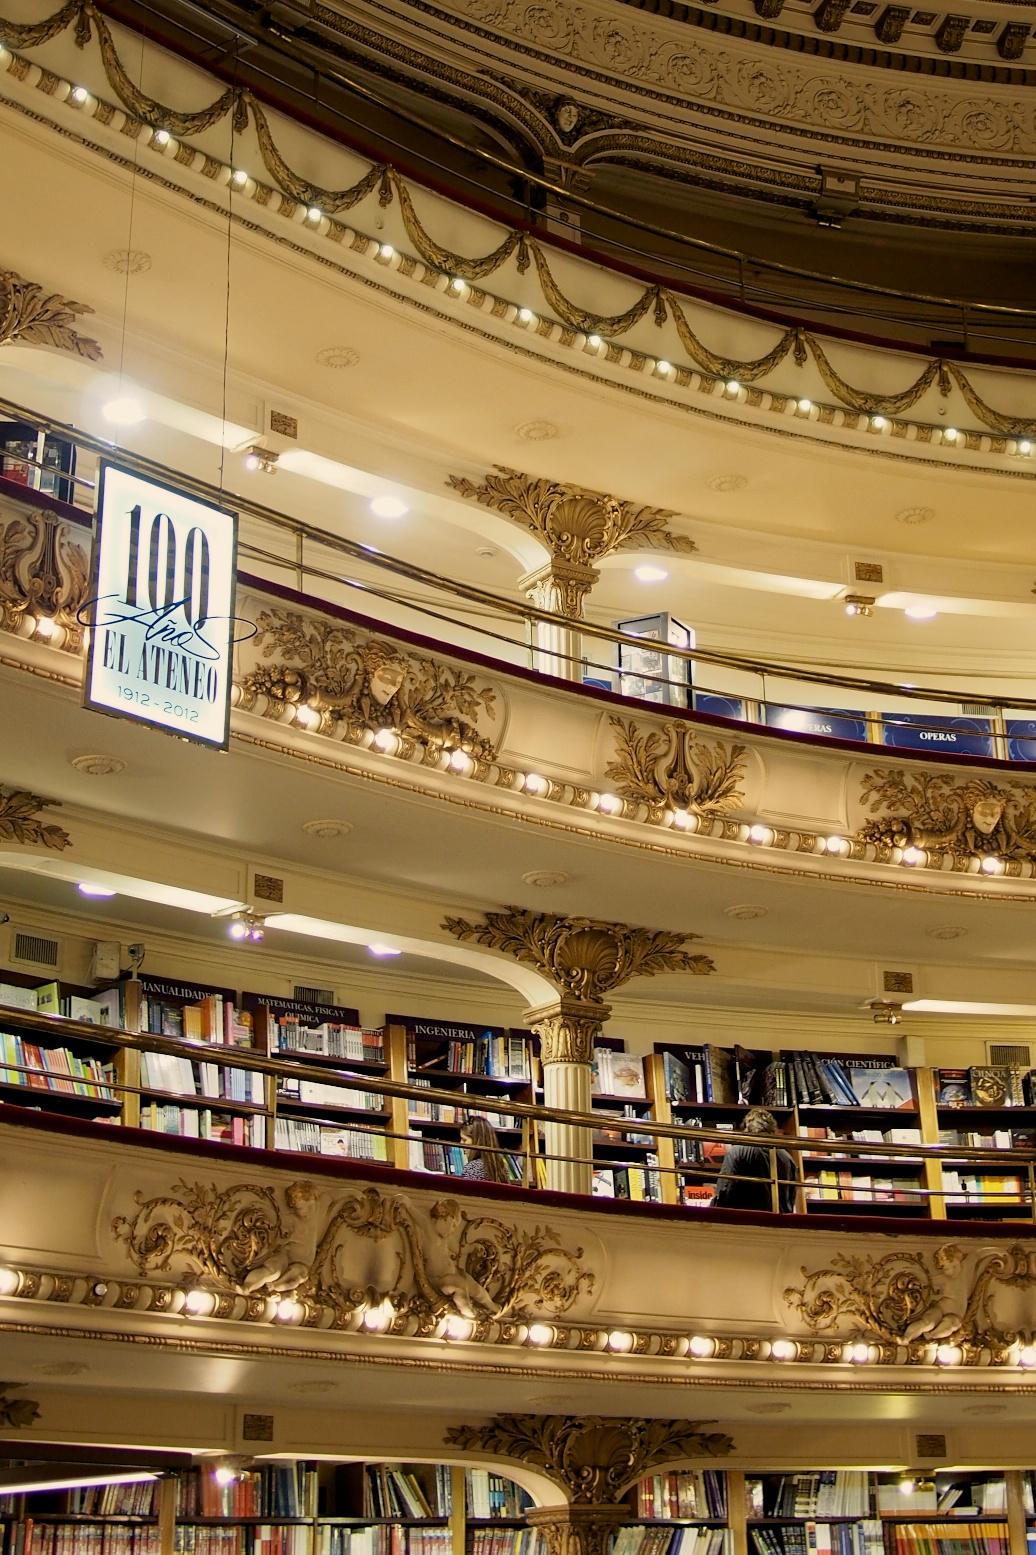 Floors and floors of books